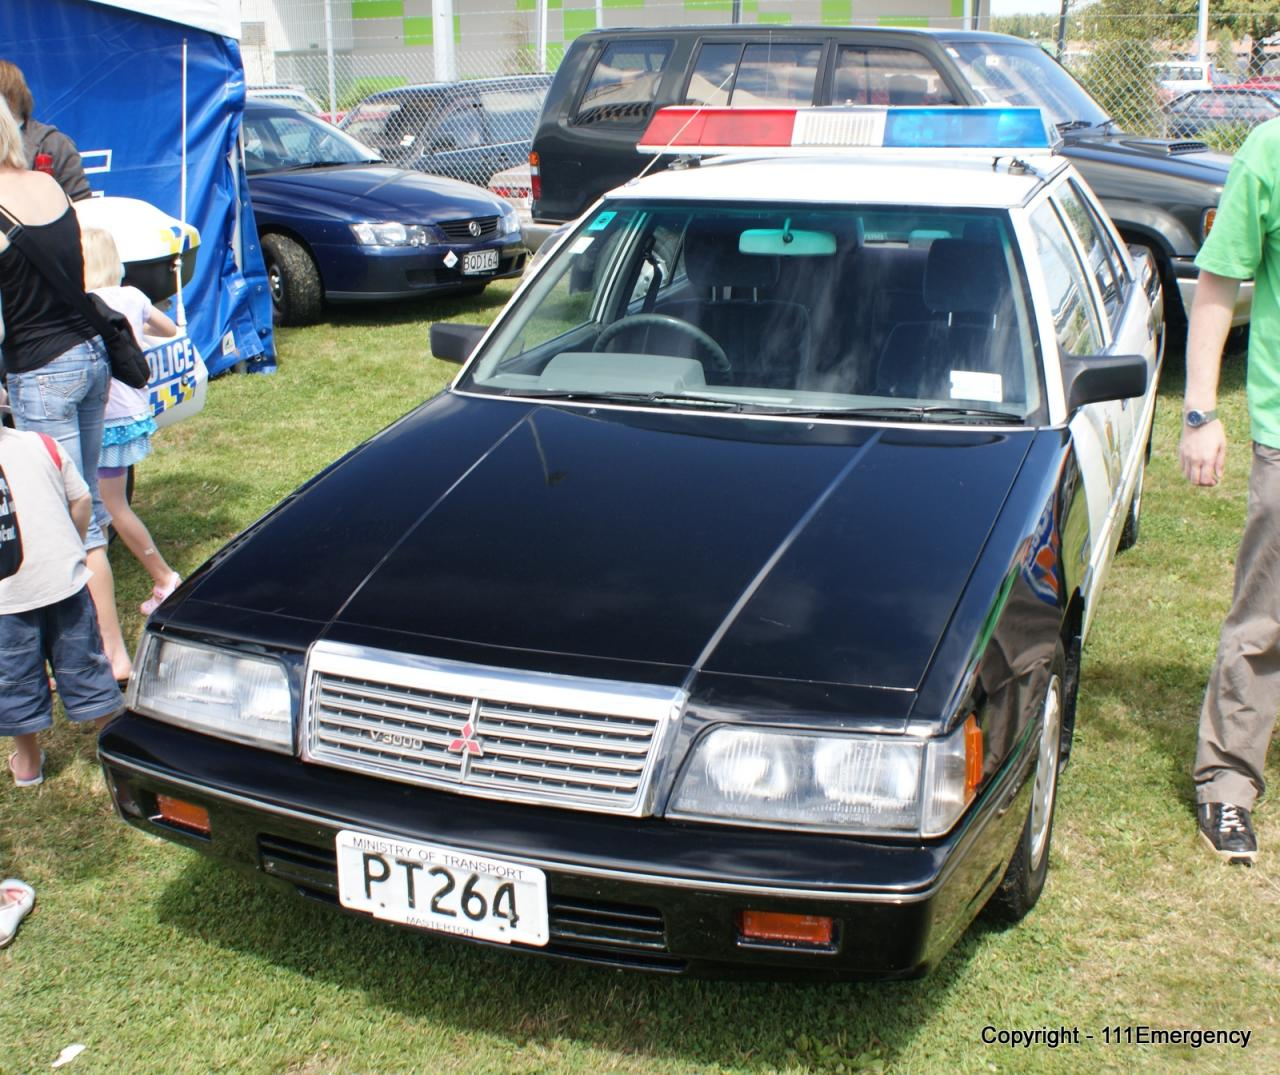 File:1990-1991 Mitsubishi V3000 Executive sedan (Ministry of ...